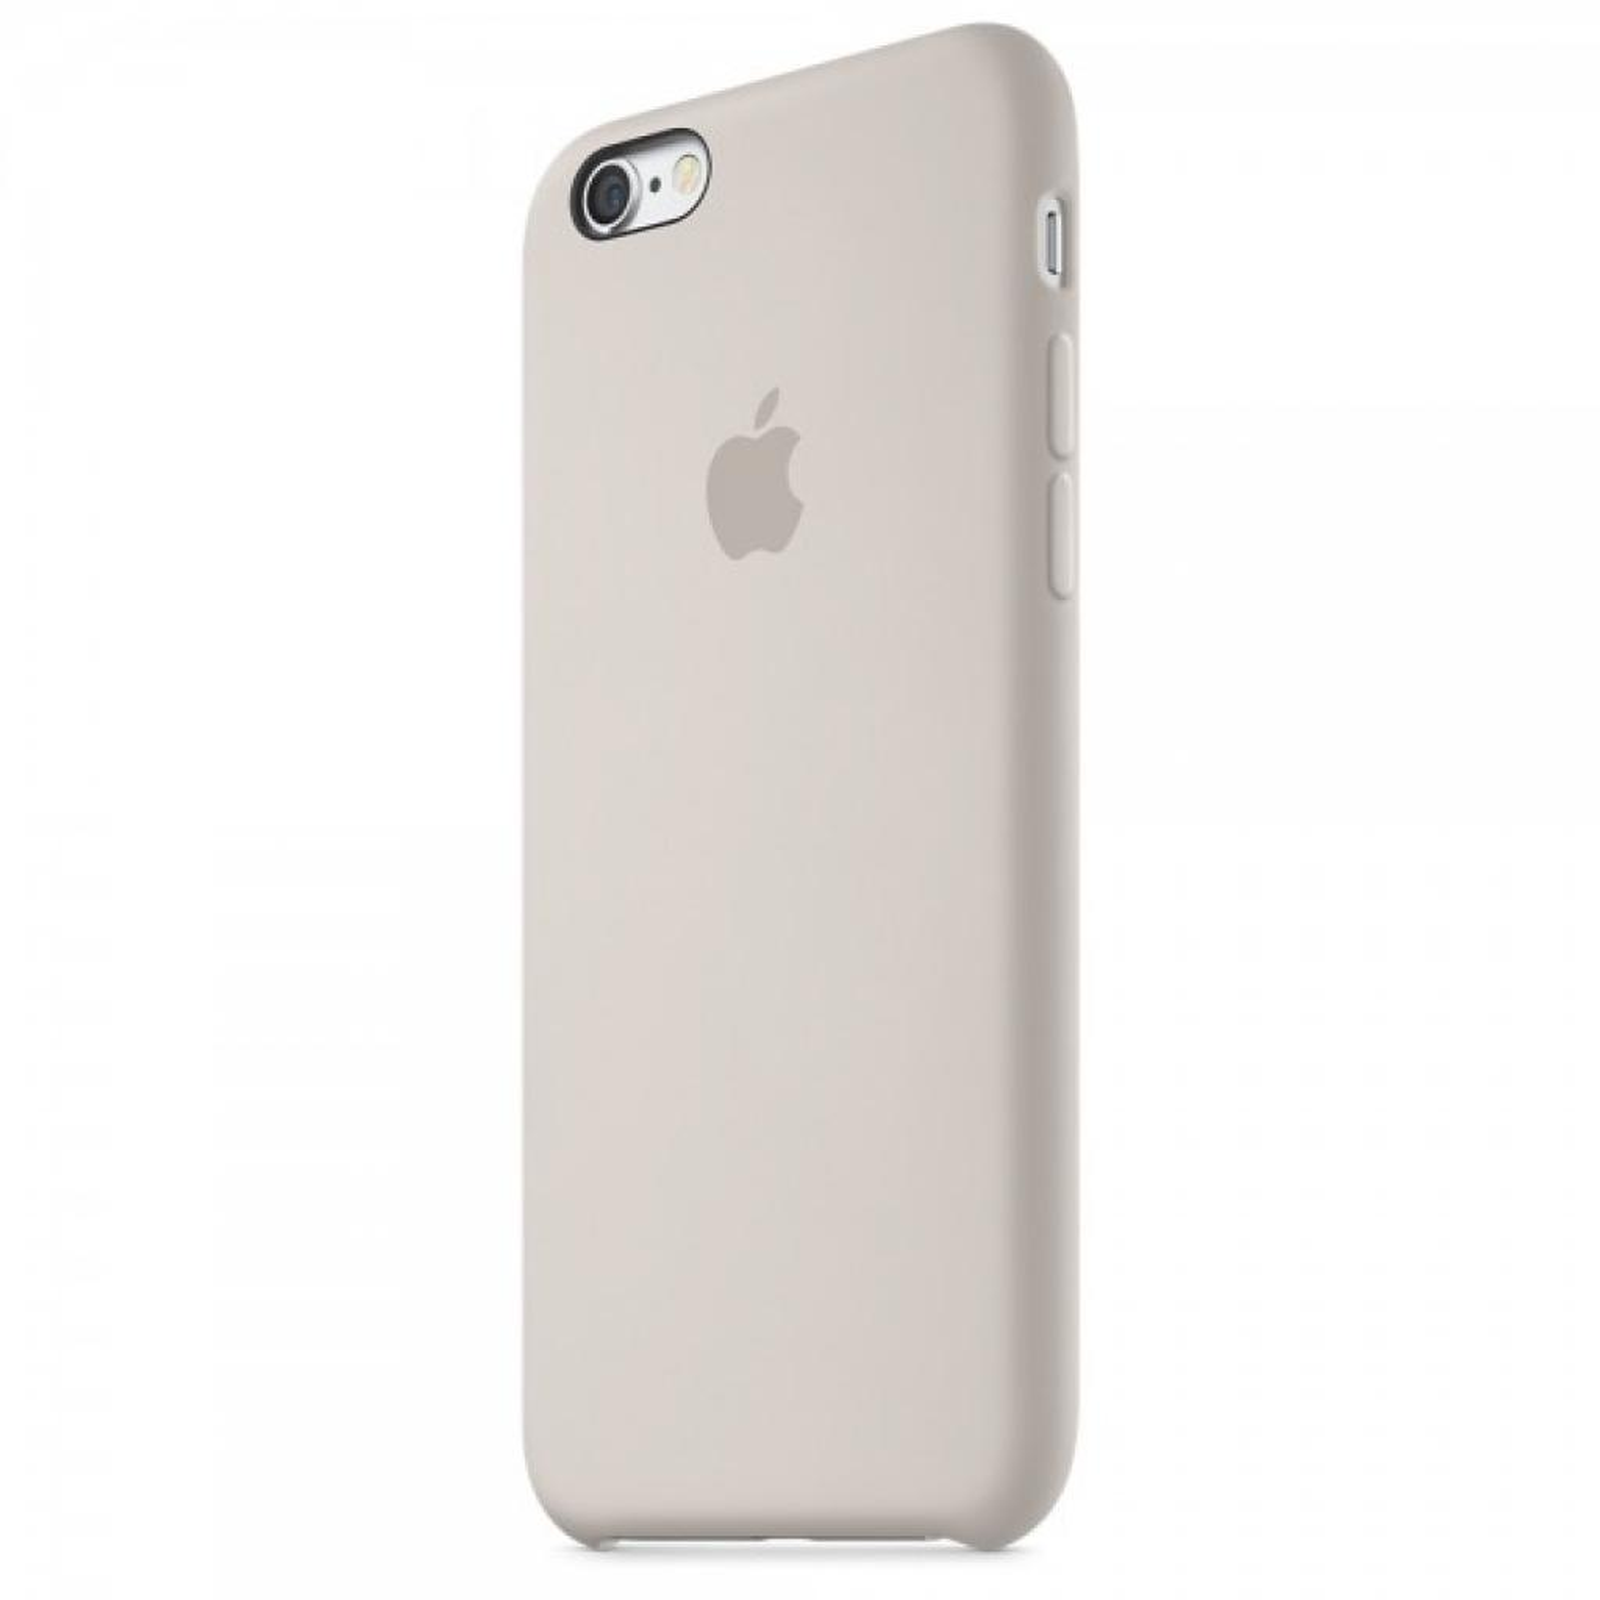 Чехол для моб. телефона Apple для iPhone 6/6s Antique White (MLCX2ZM/A) изображение 2